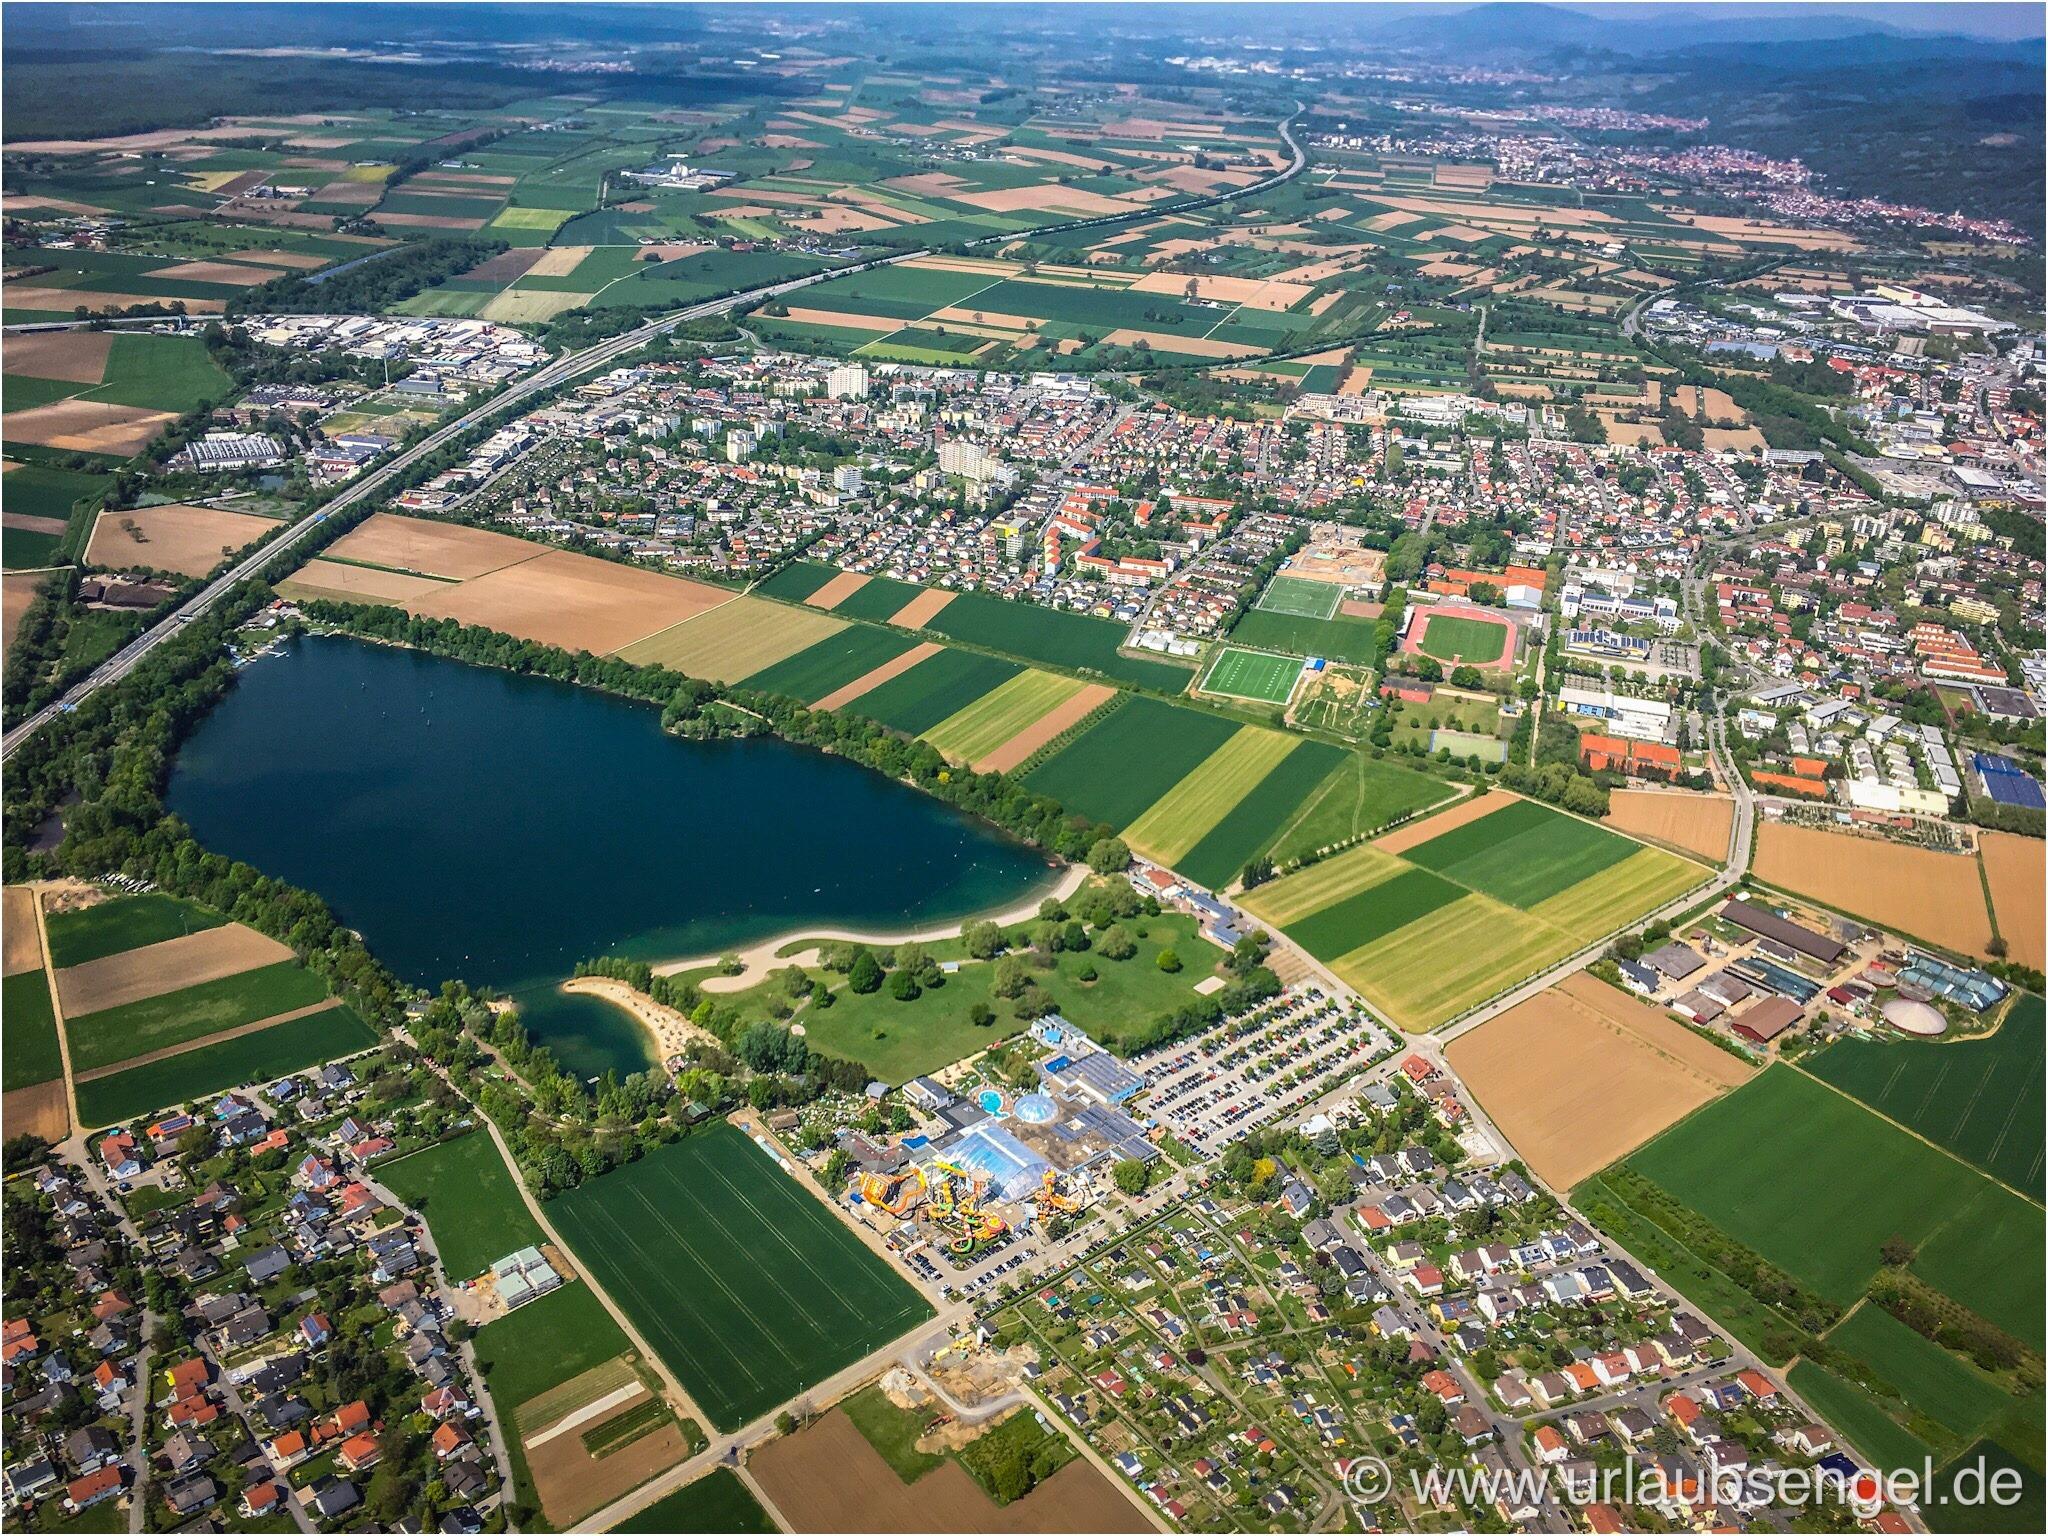 Luftbild Weinheimer Baggersee aus dem Gyrocopter